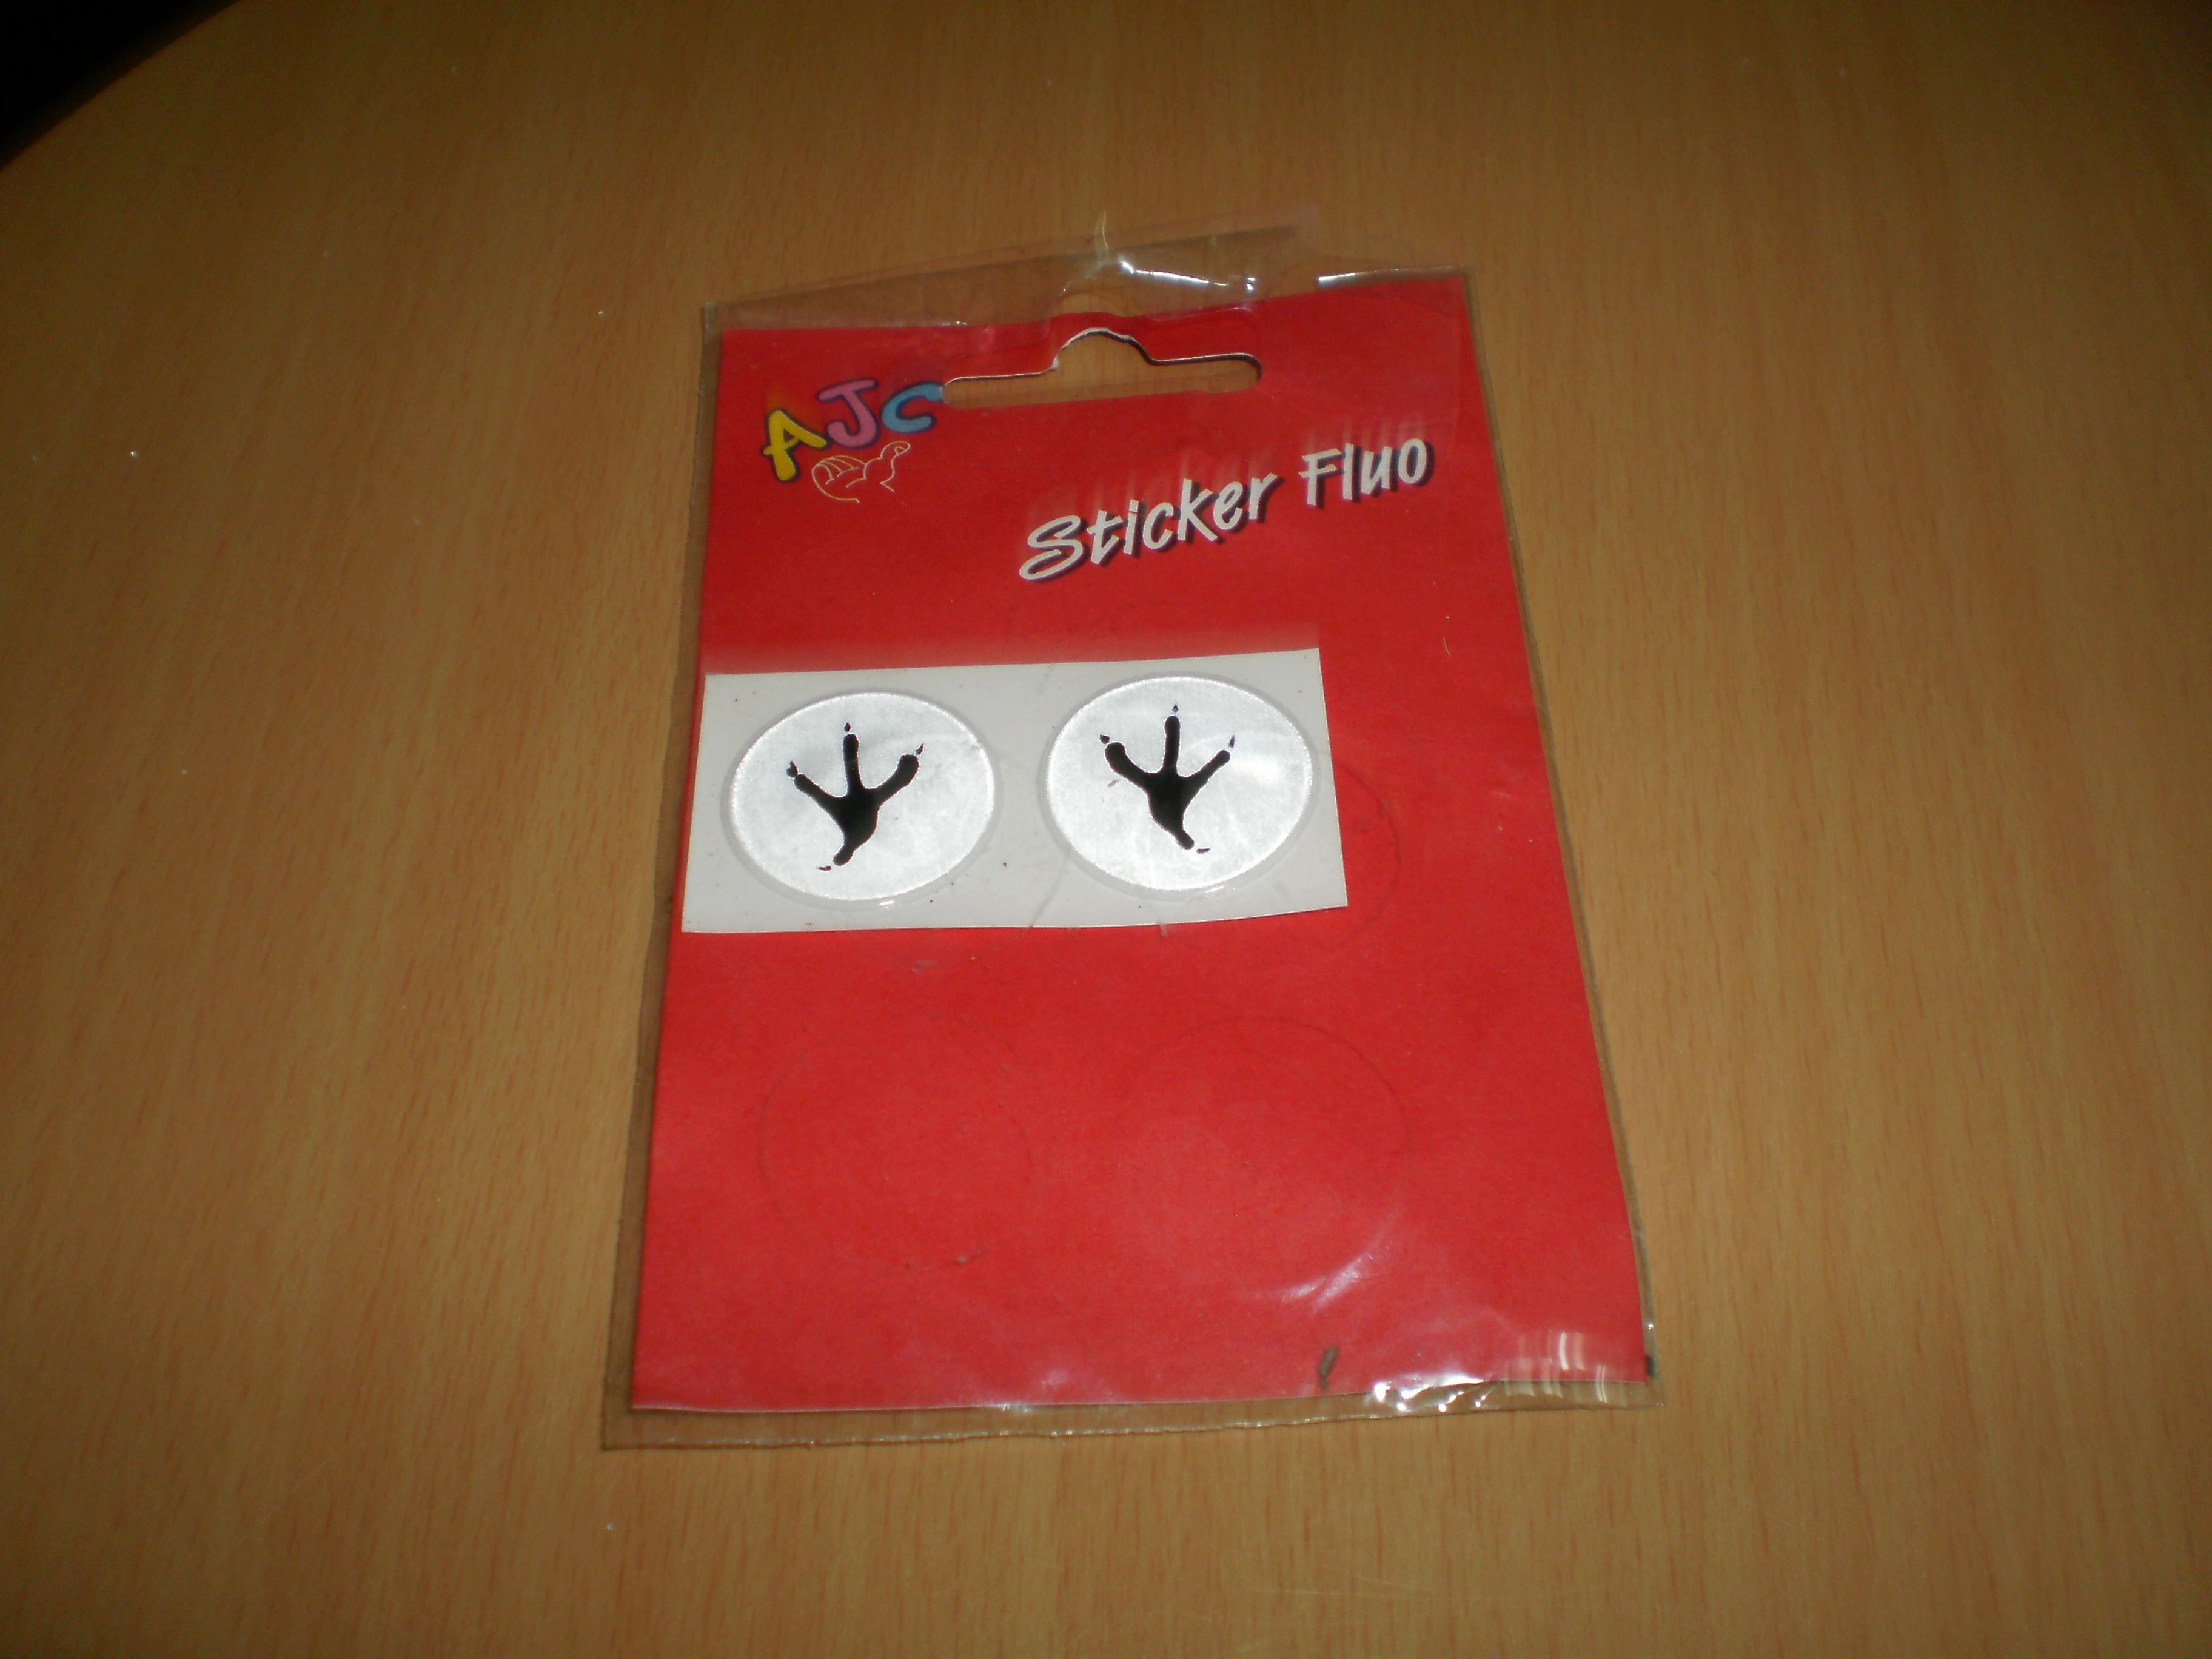 troc de troc 2 stickers nfs emballés image 0